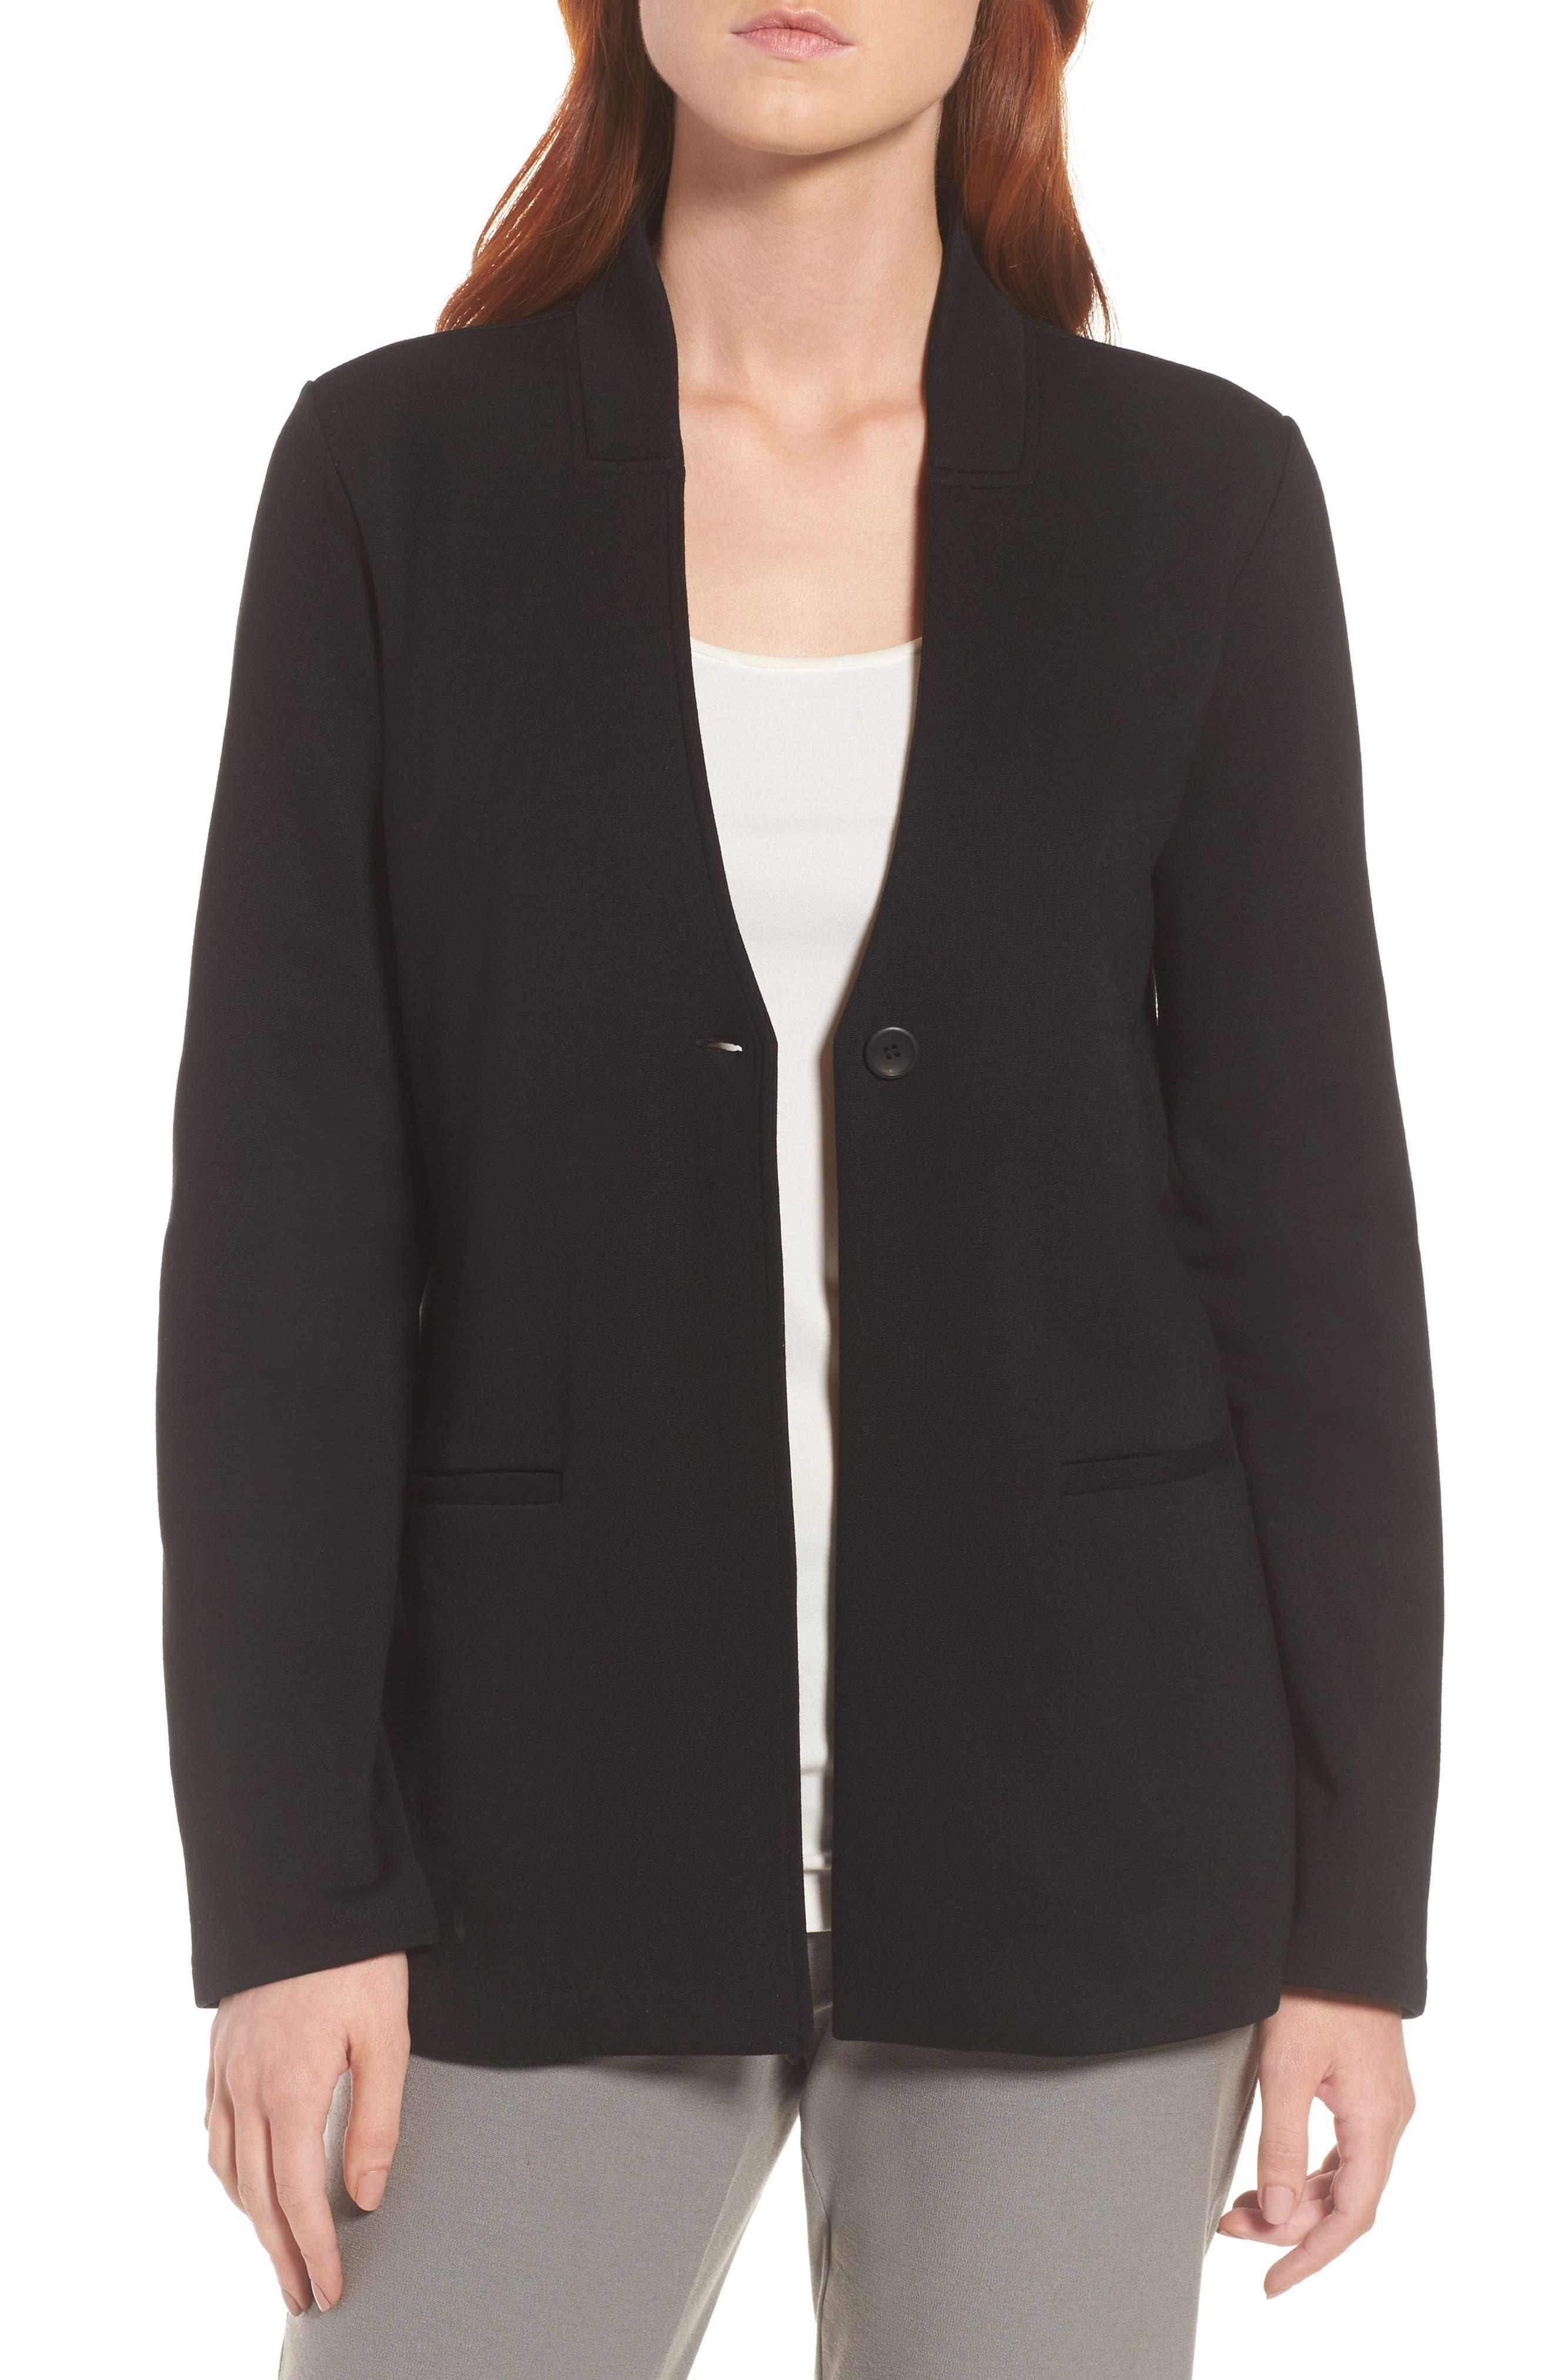 Tencel<sup>®</sup> Lyocell Blend Knit Blazer,                             Main thumbnail 1, color,                             Black